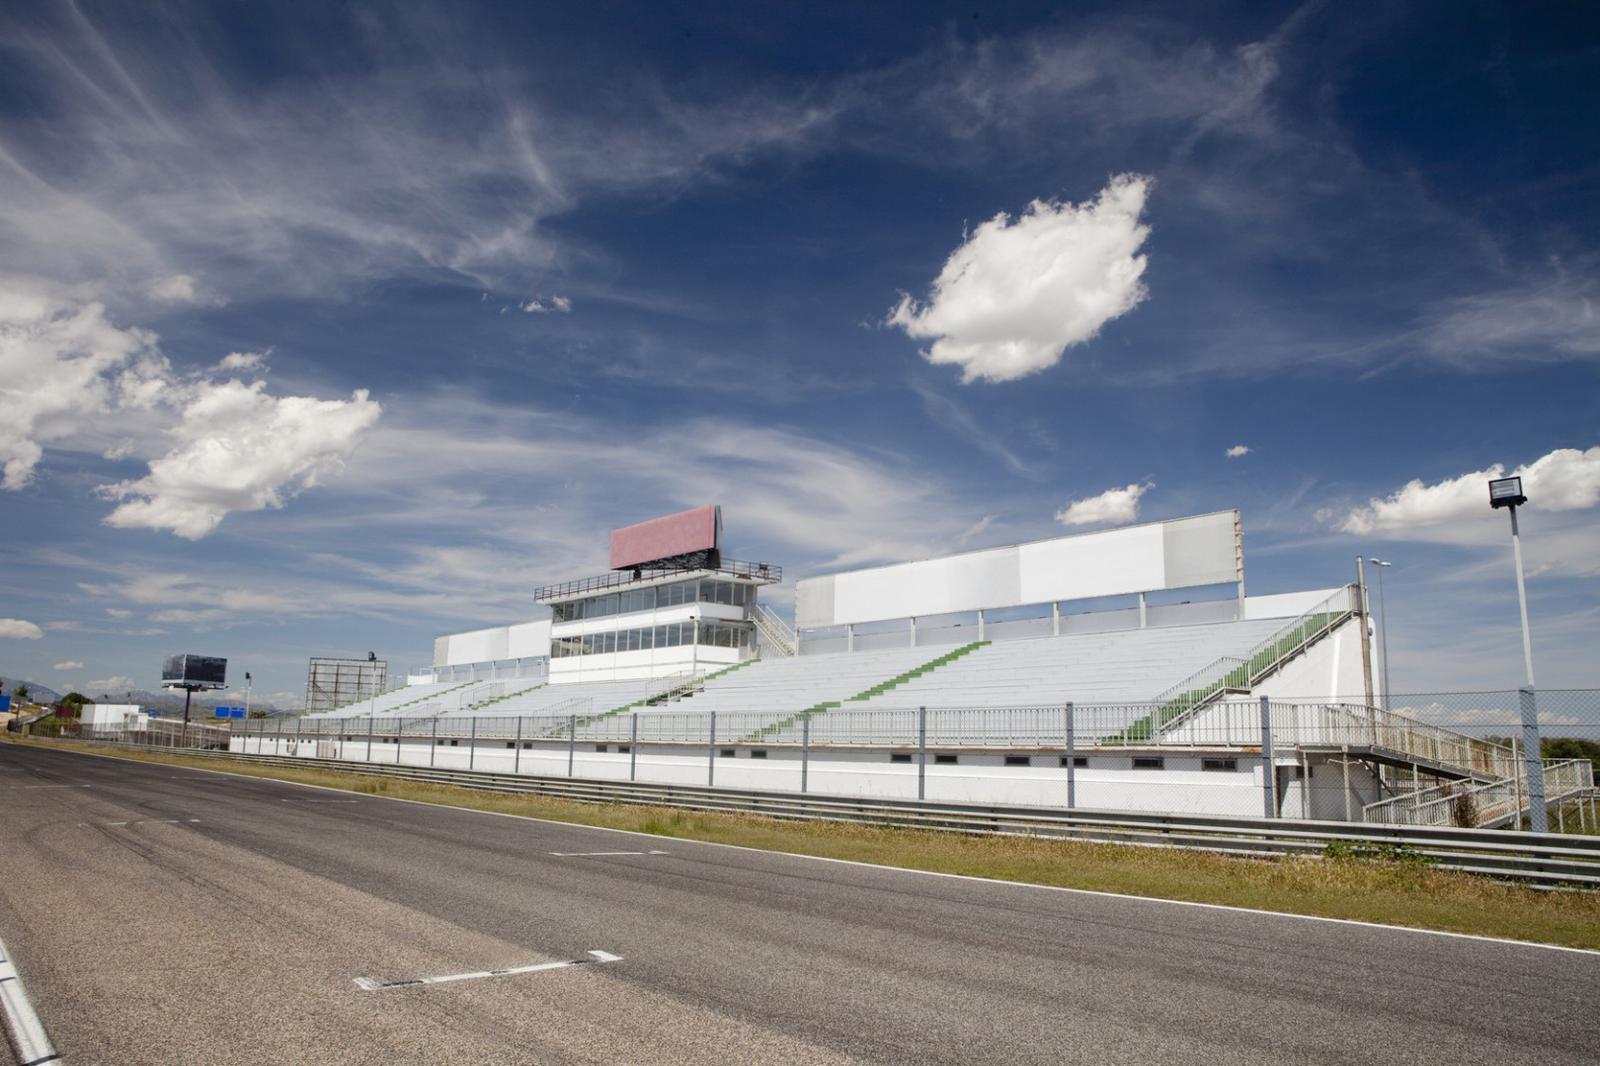 Jarama racetrack tribune.